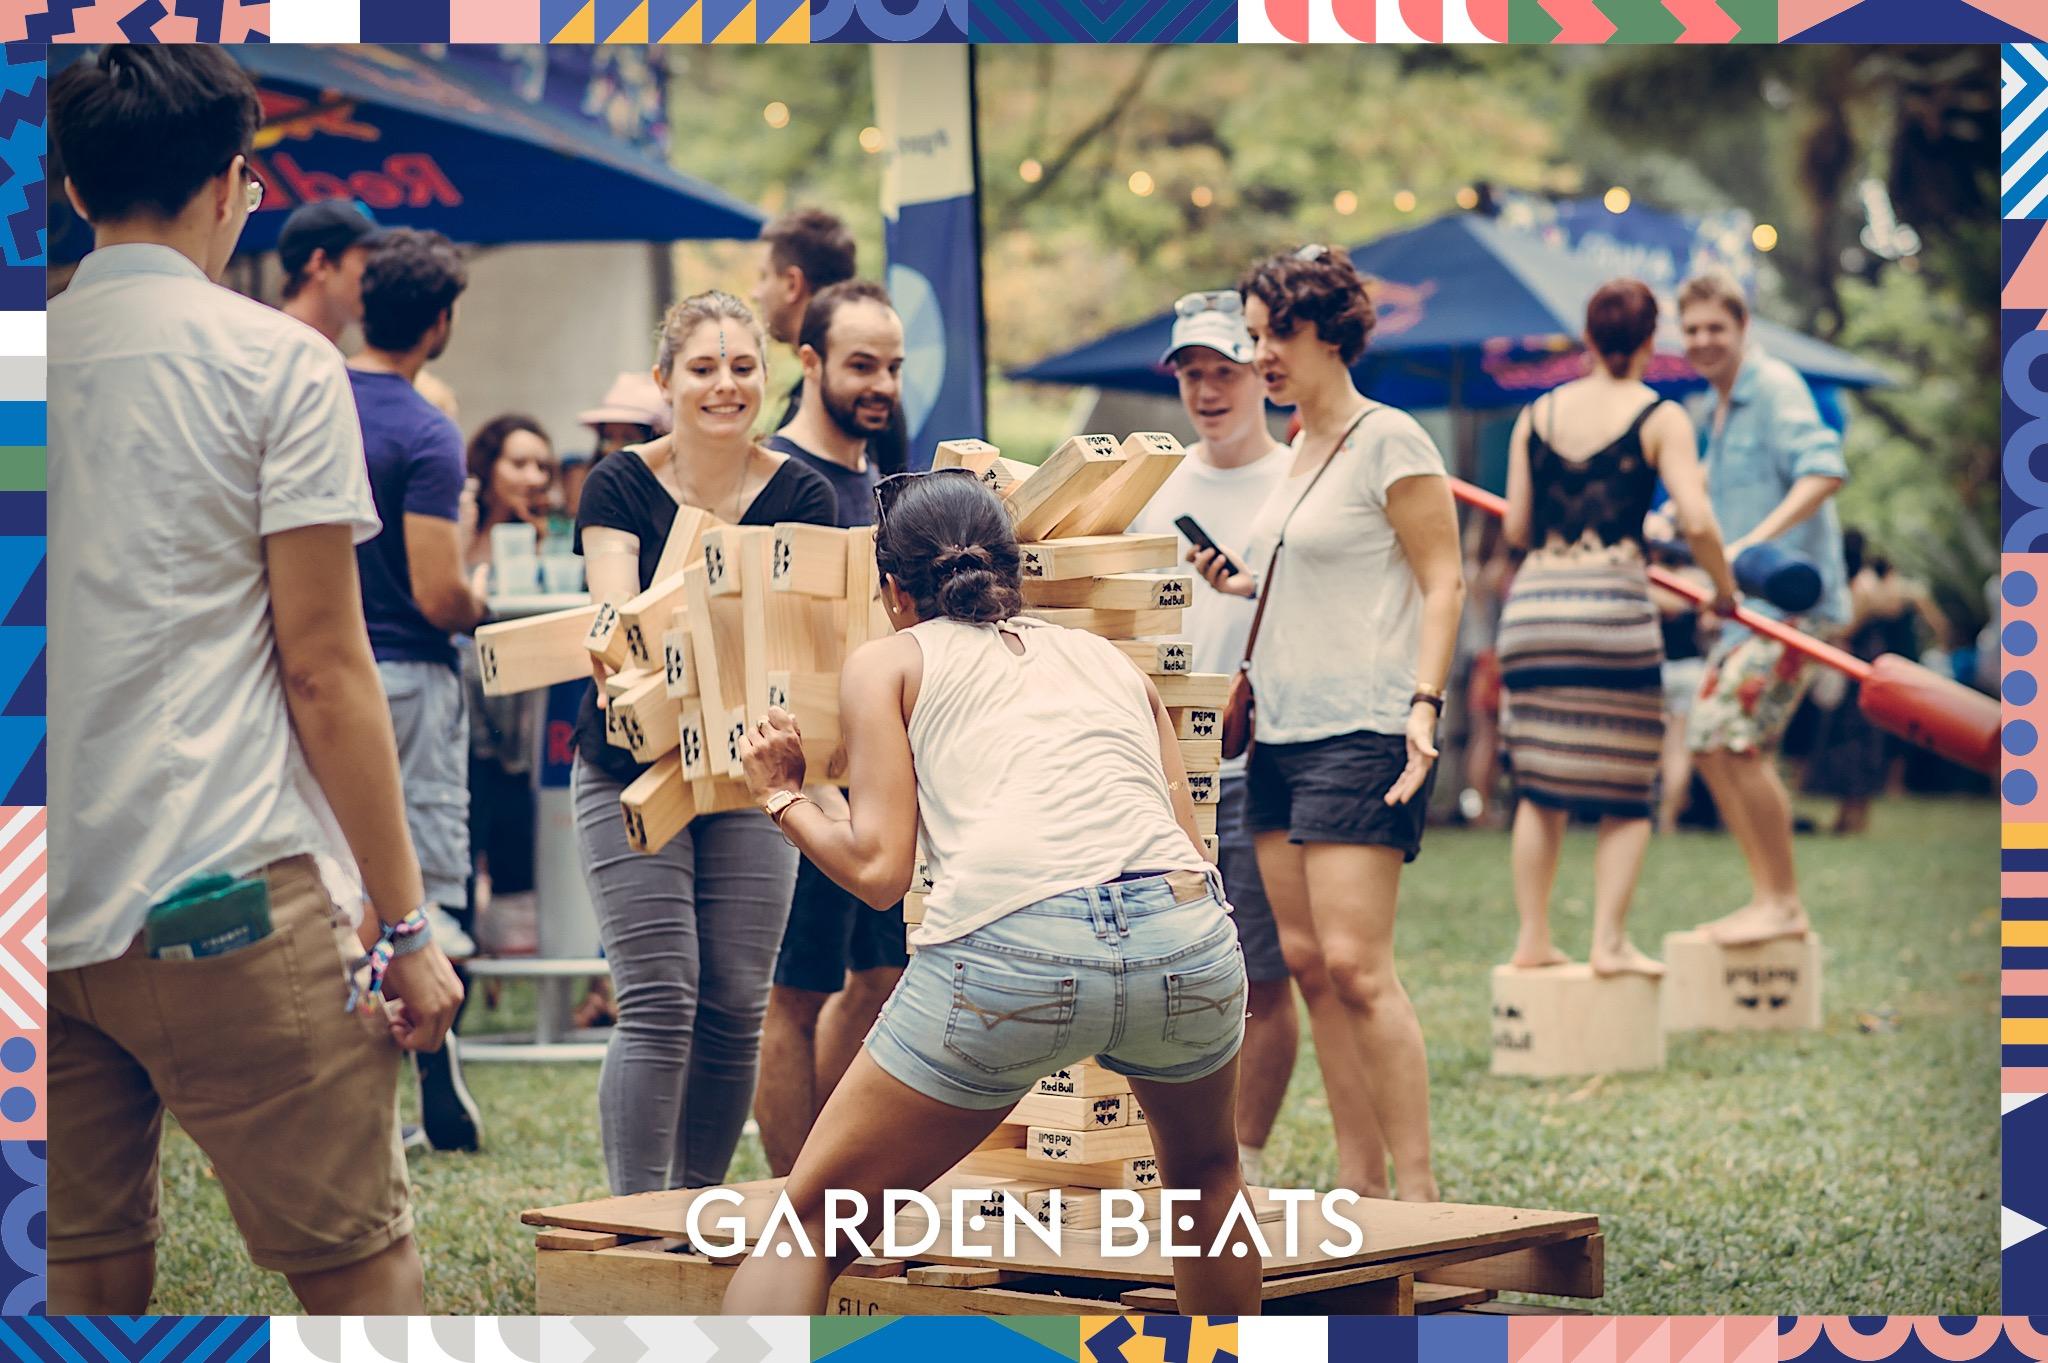 03032018_GardenBeats_Colossal358_Watermarked.jpg